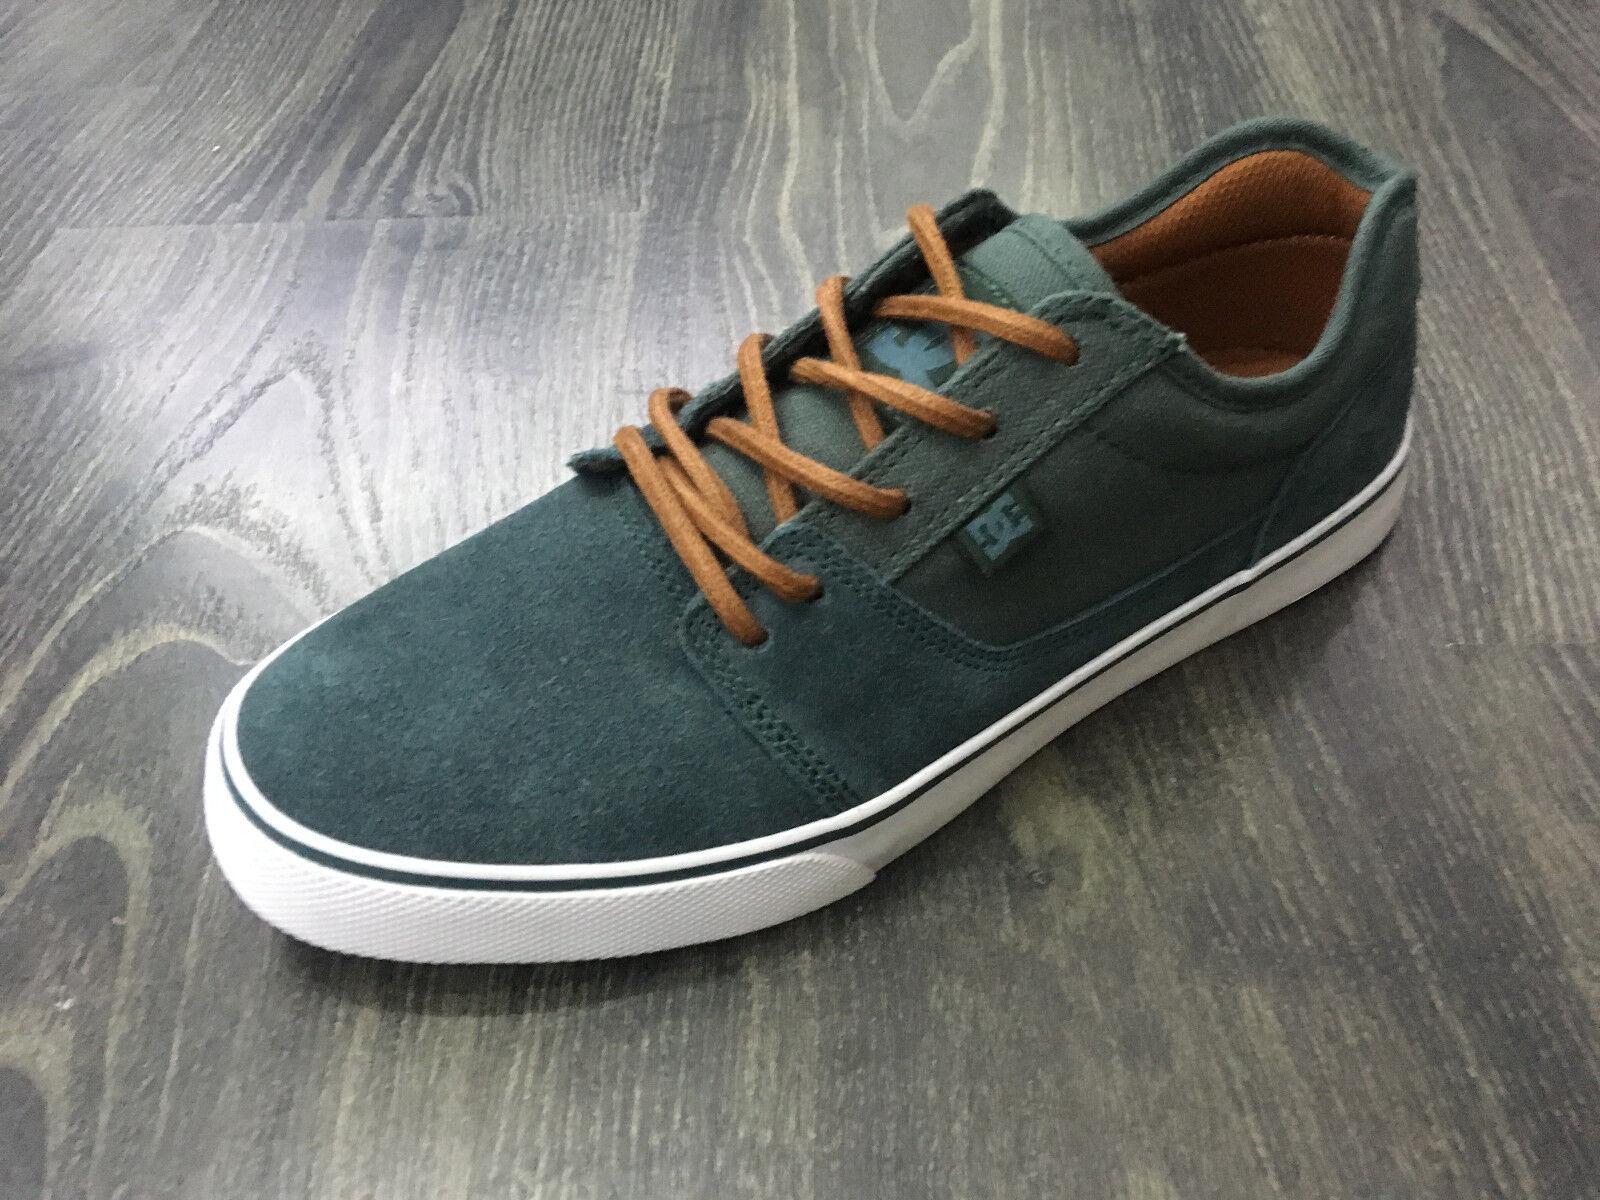 DC Schuhe skate Herrenschuhe Tonik deep jungle skate Schuhe Turnschuhe e45316